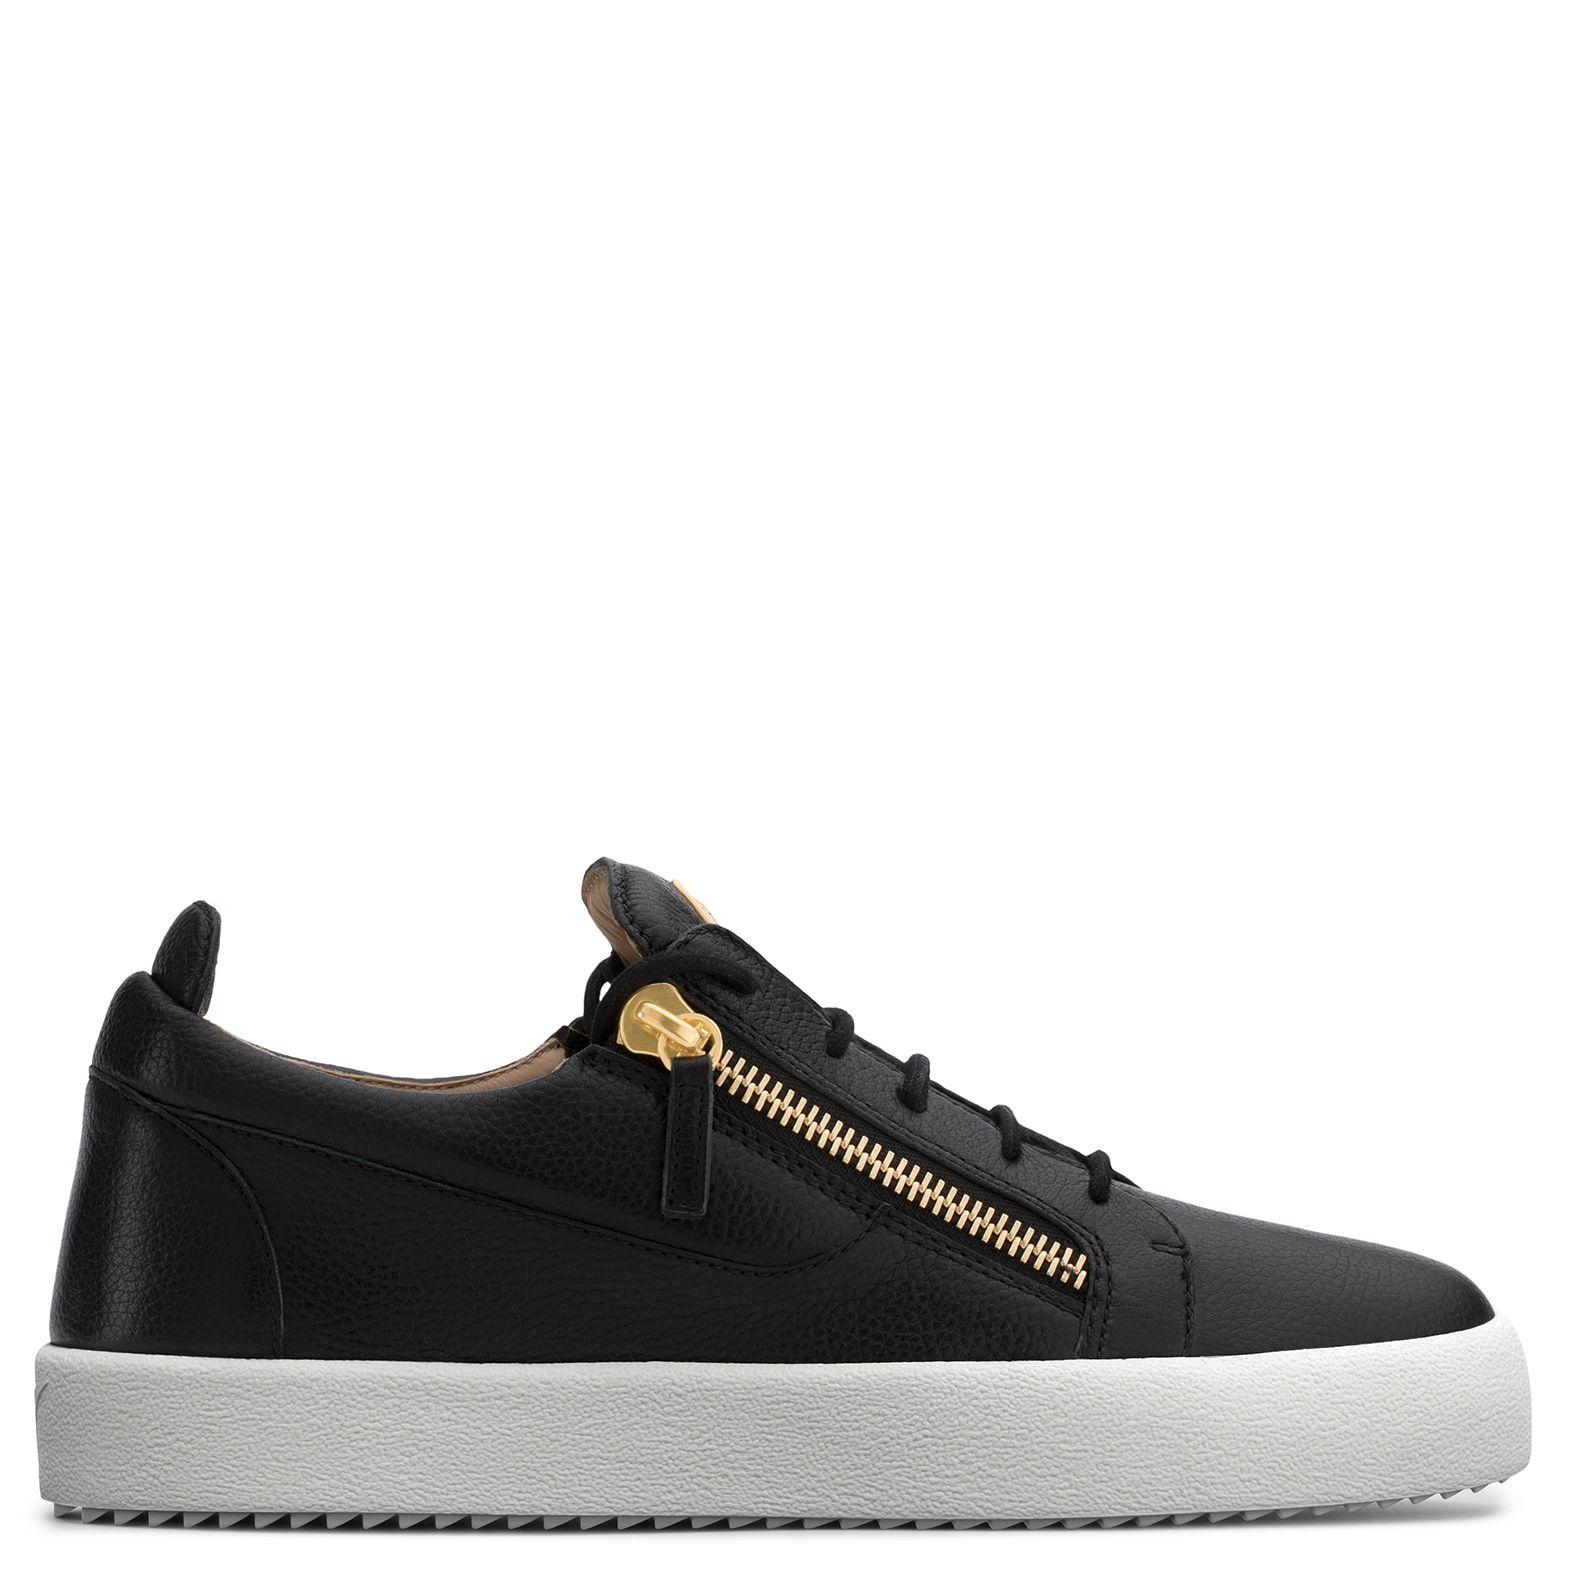 Leather sneakers, Giuseppe zanotti